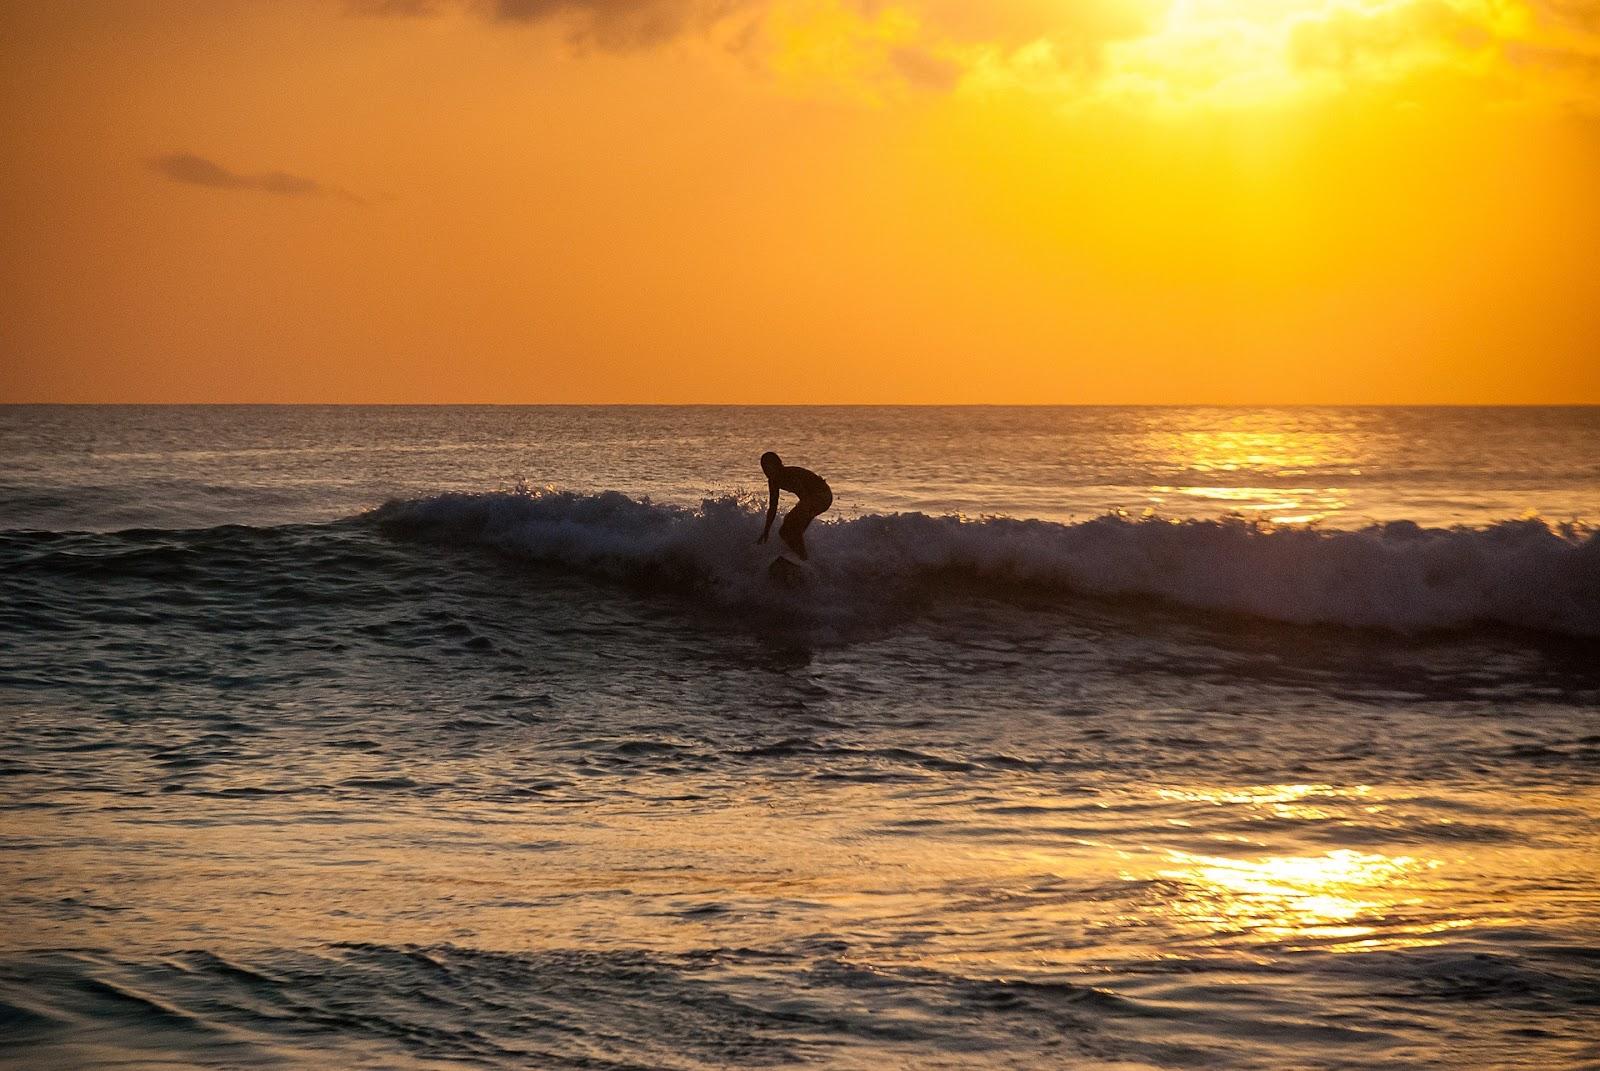 surfer surfing blue ocean wave during sunset in medewi bali indonesia